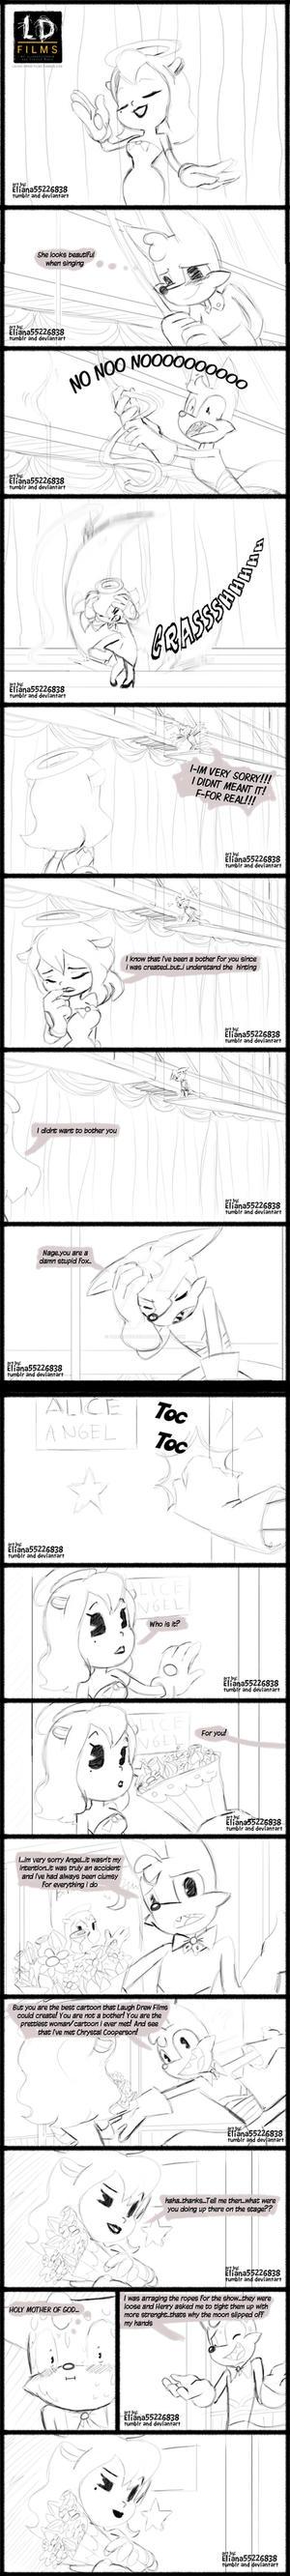 Doodle Alice and Nage by eliana55226838